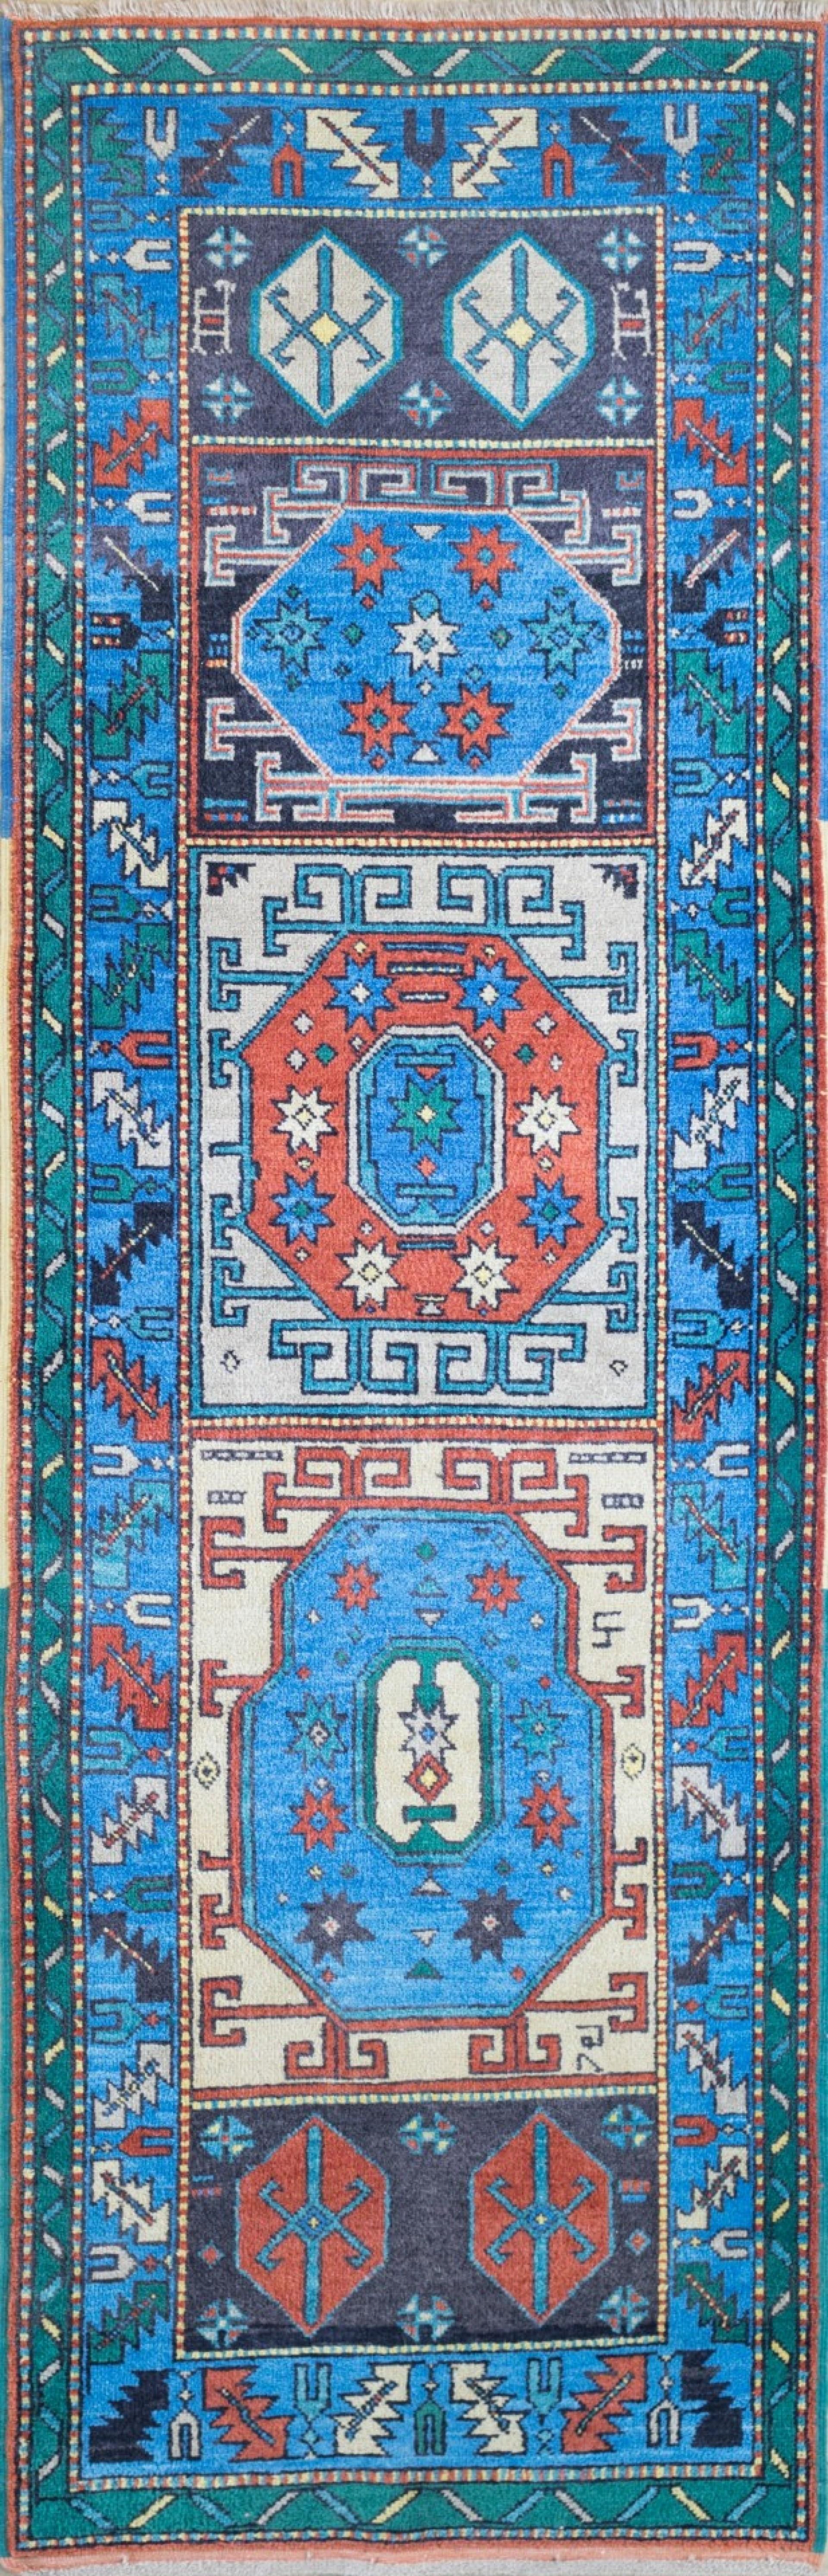 KAZAKH BLUE